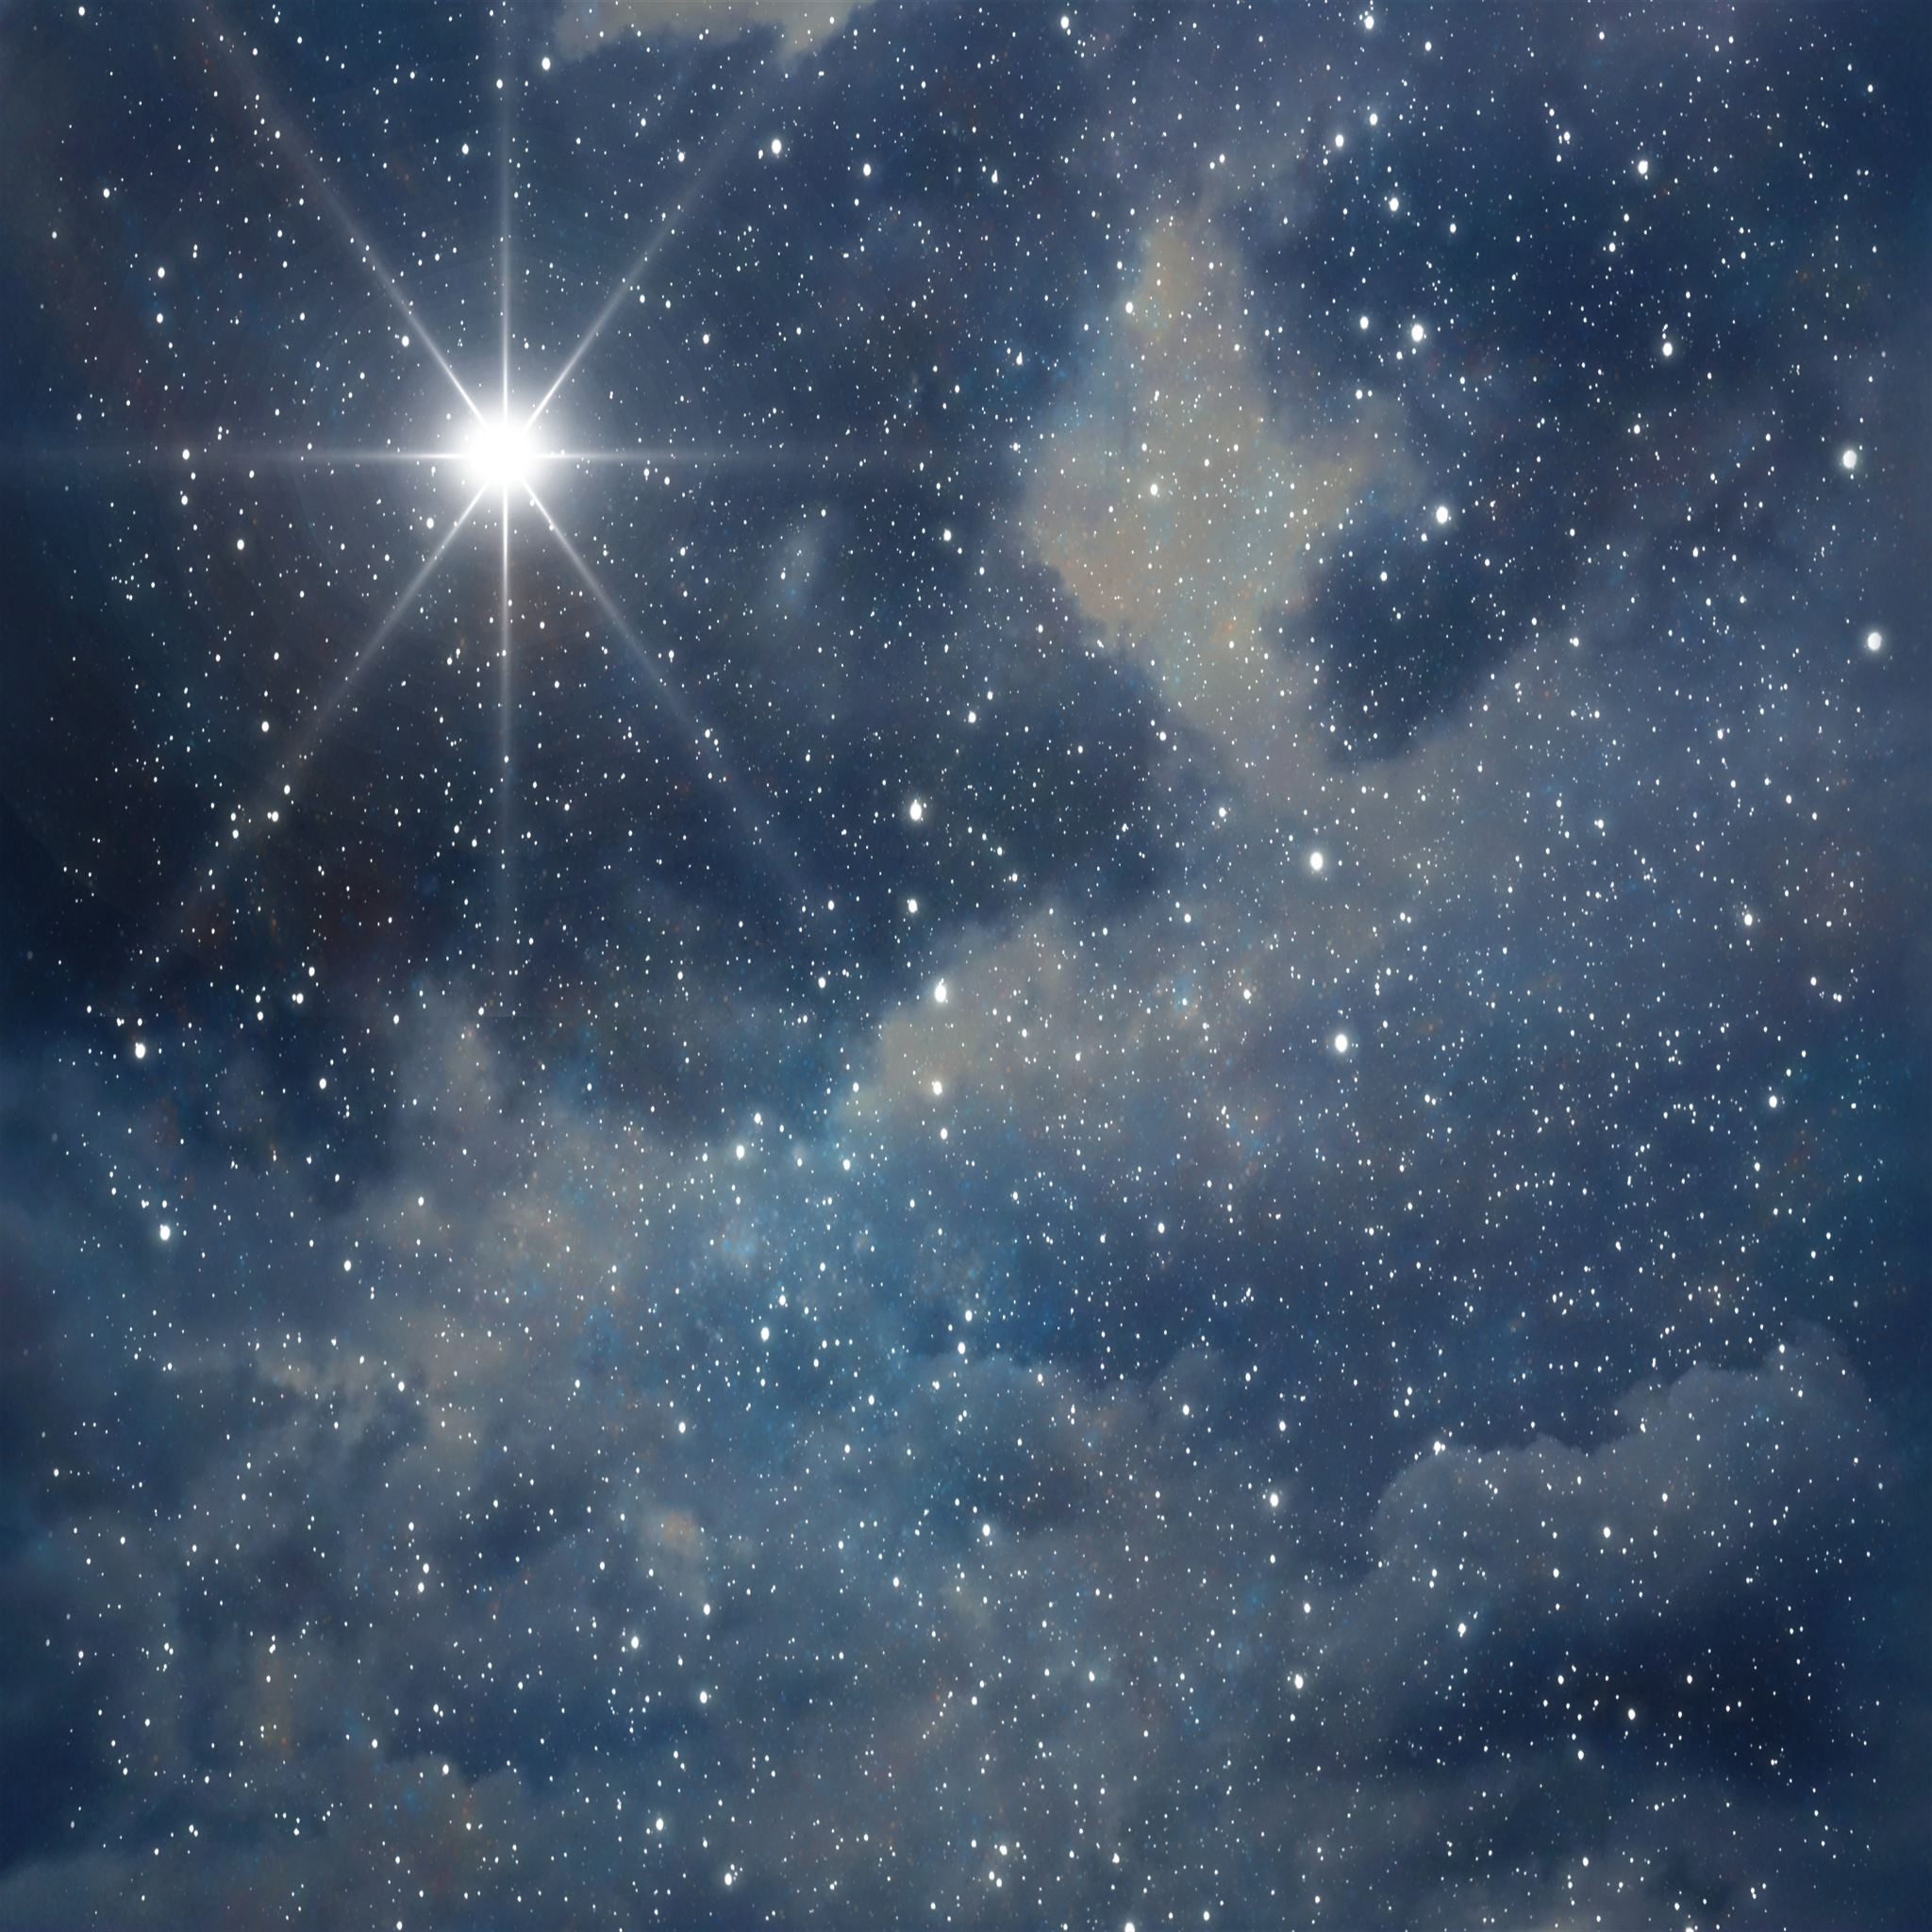 blue night sky background - photo #48